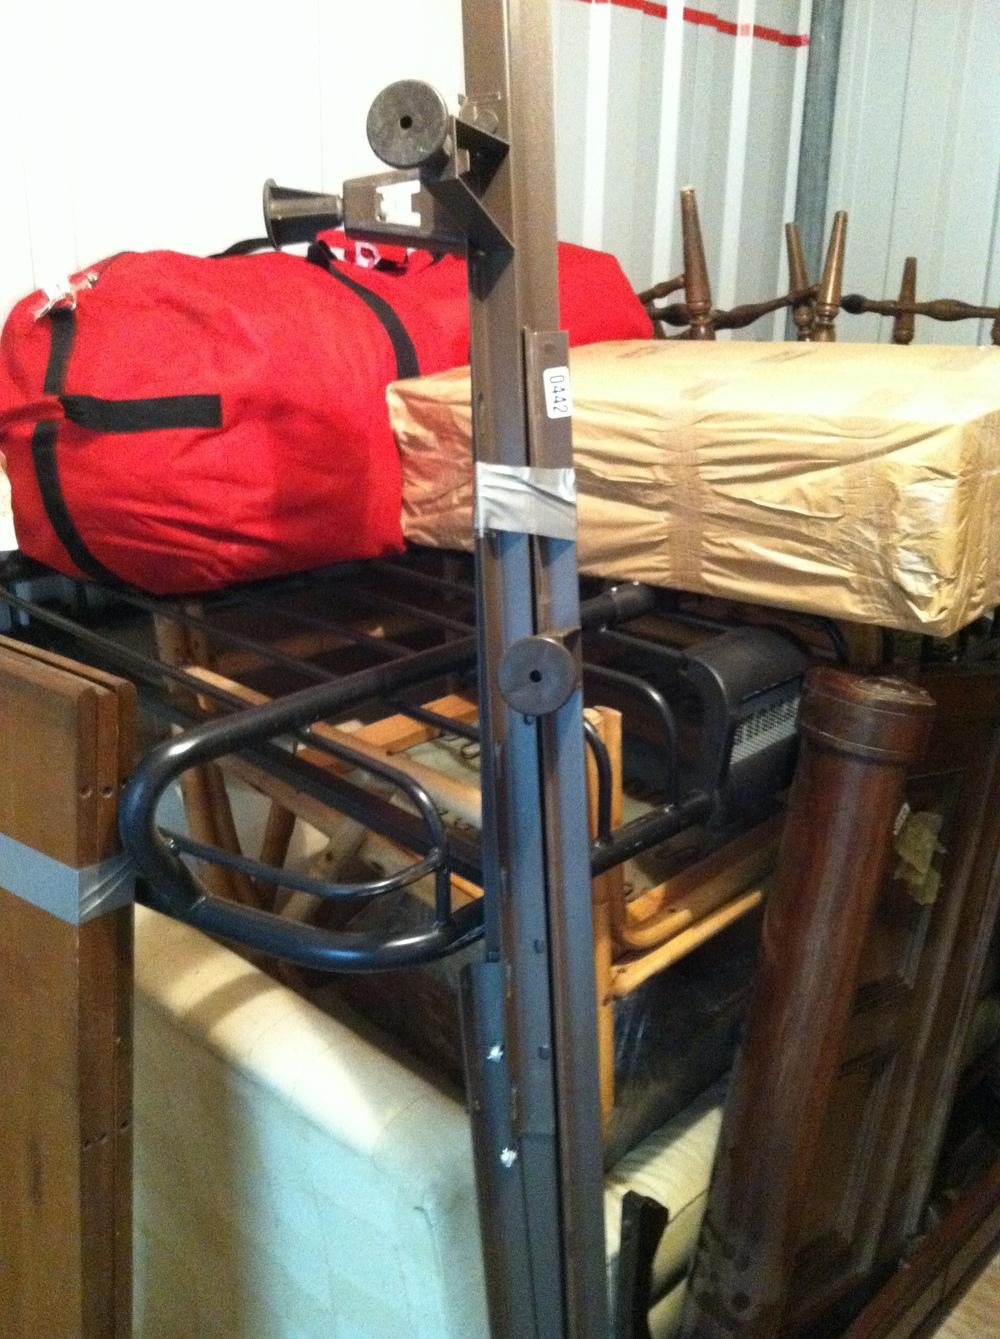 0442: Metal Bed Frame (3x)